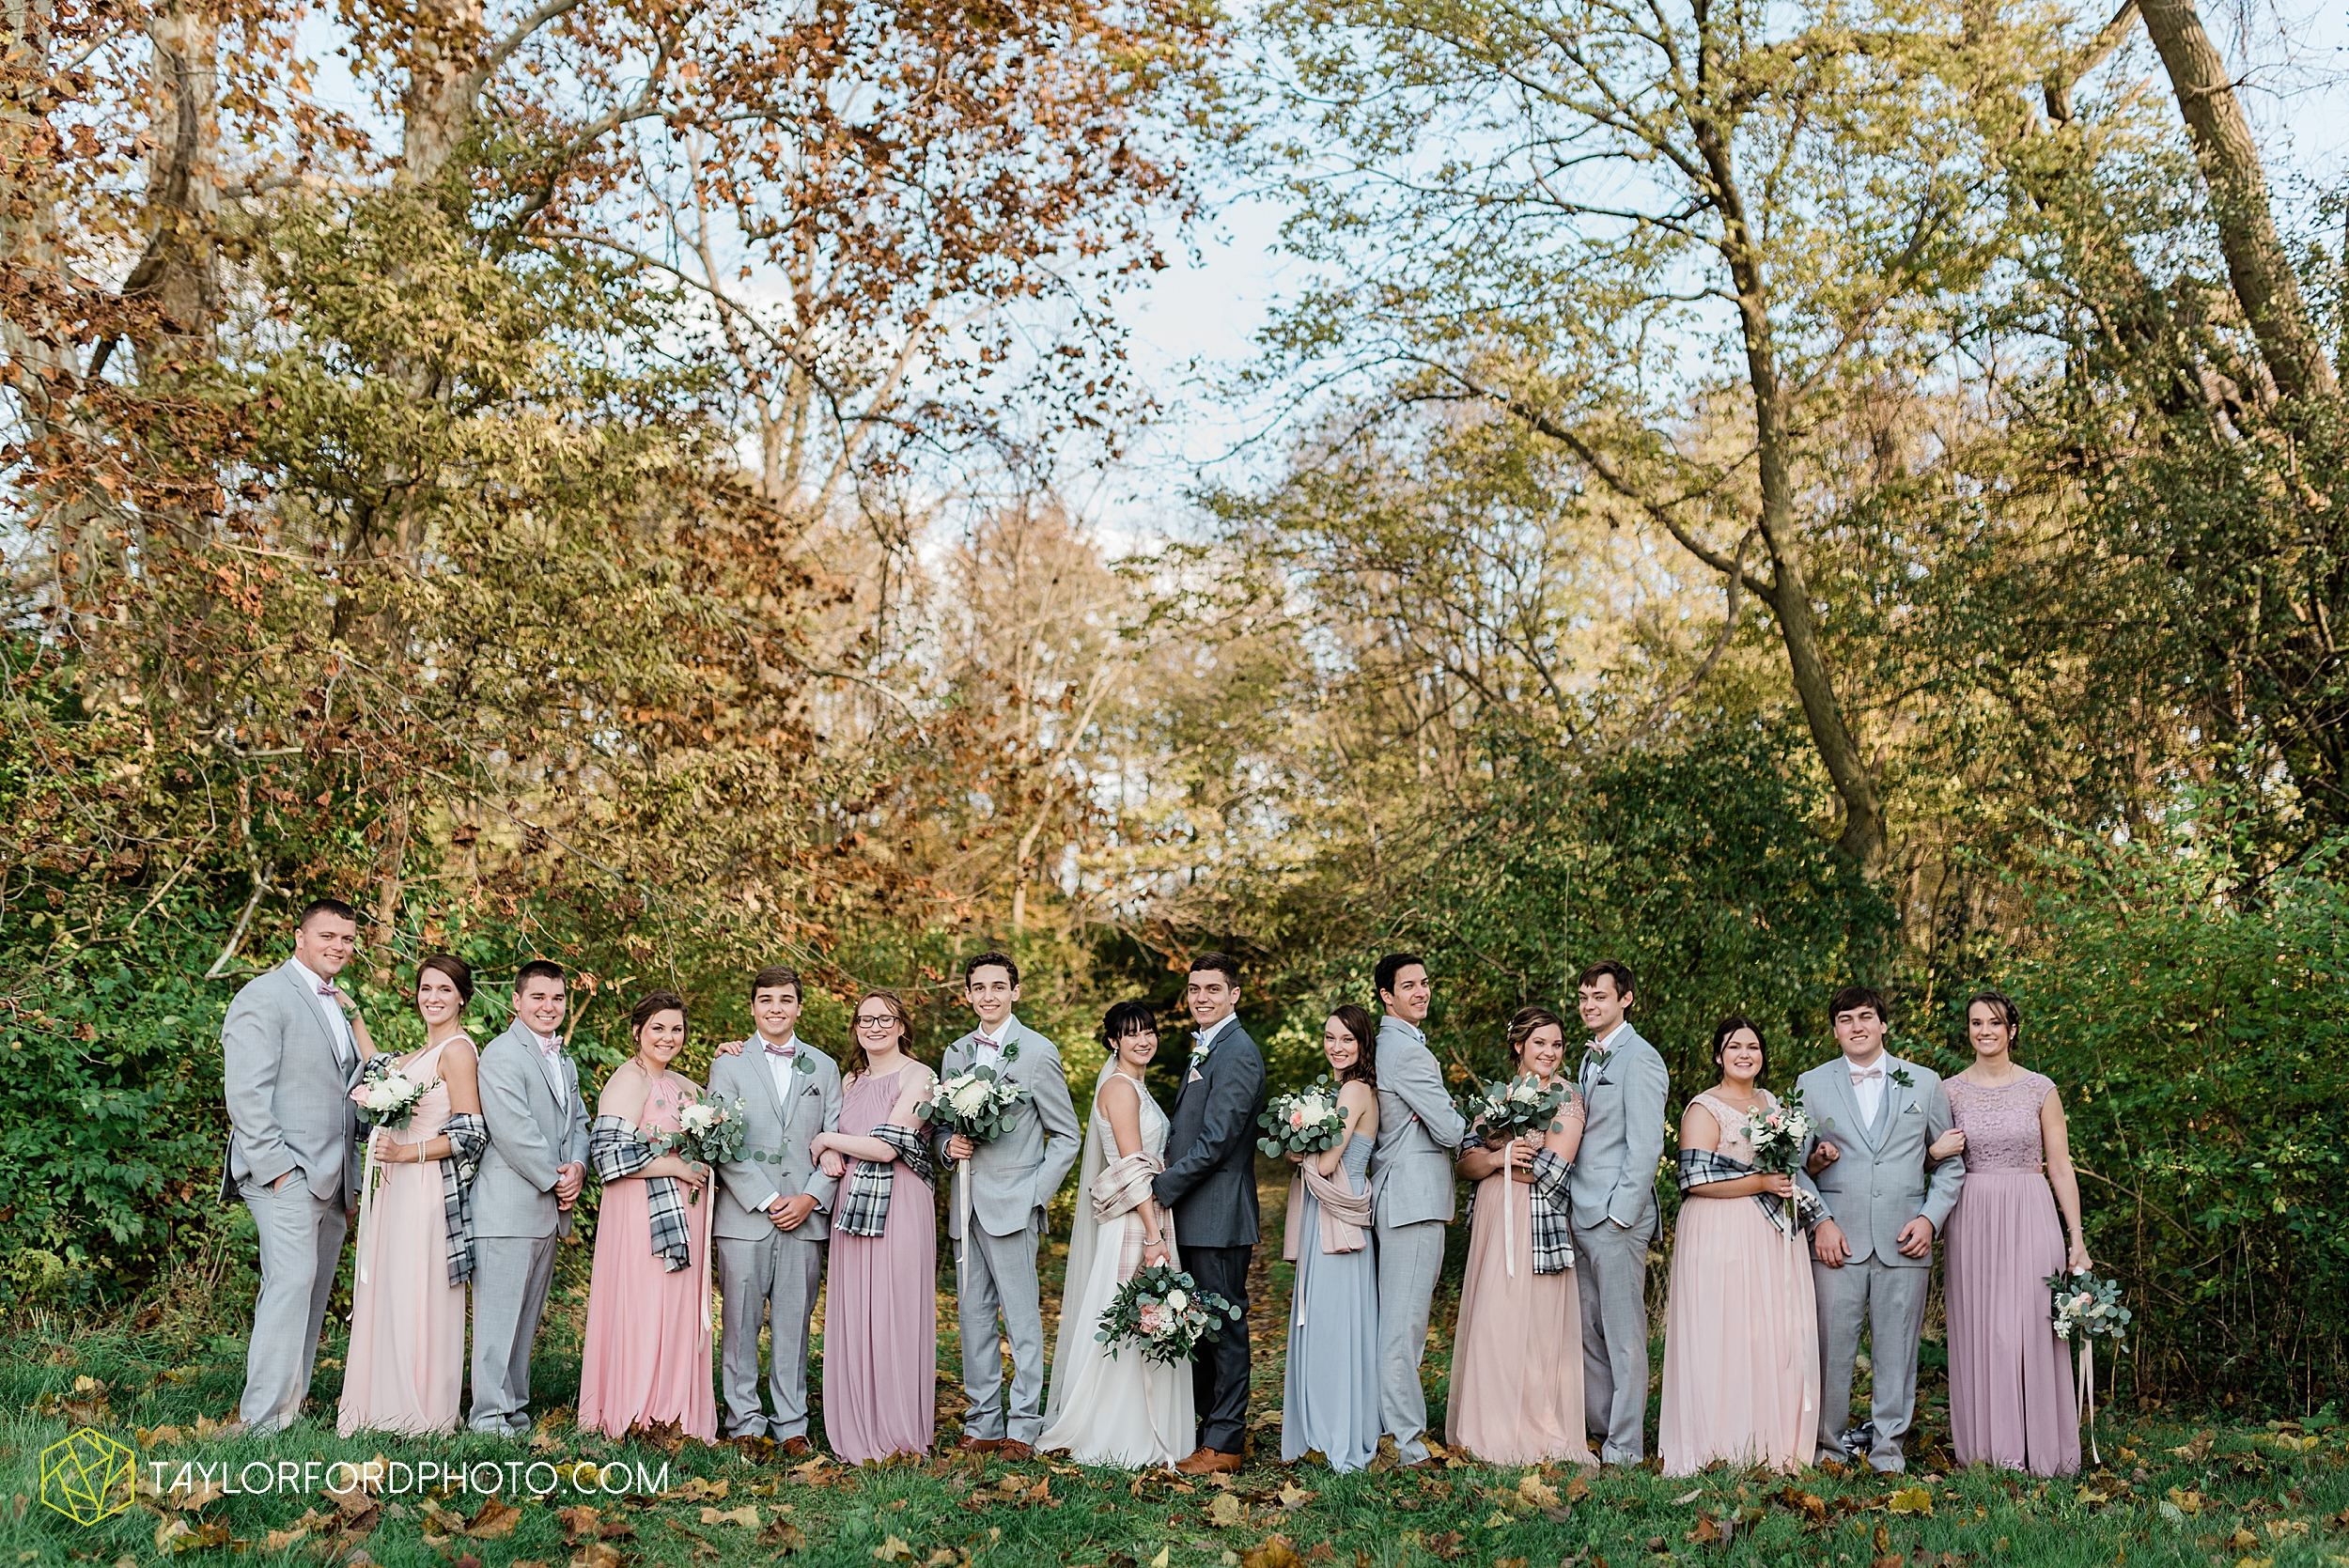 marissa-nicole-nick-daeger-orrmont-estate-farm-wedding-piqua-dayton-troy-ohio-fall-photographer-taylor-ford-photography_1532.jpg